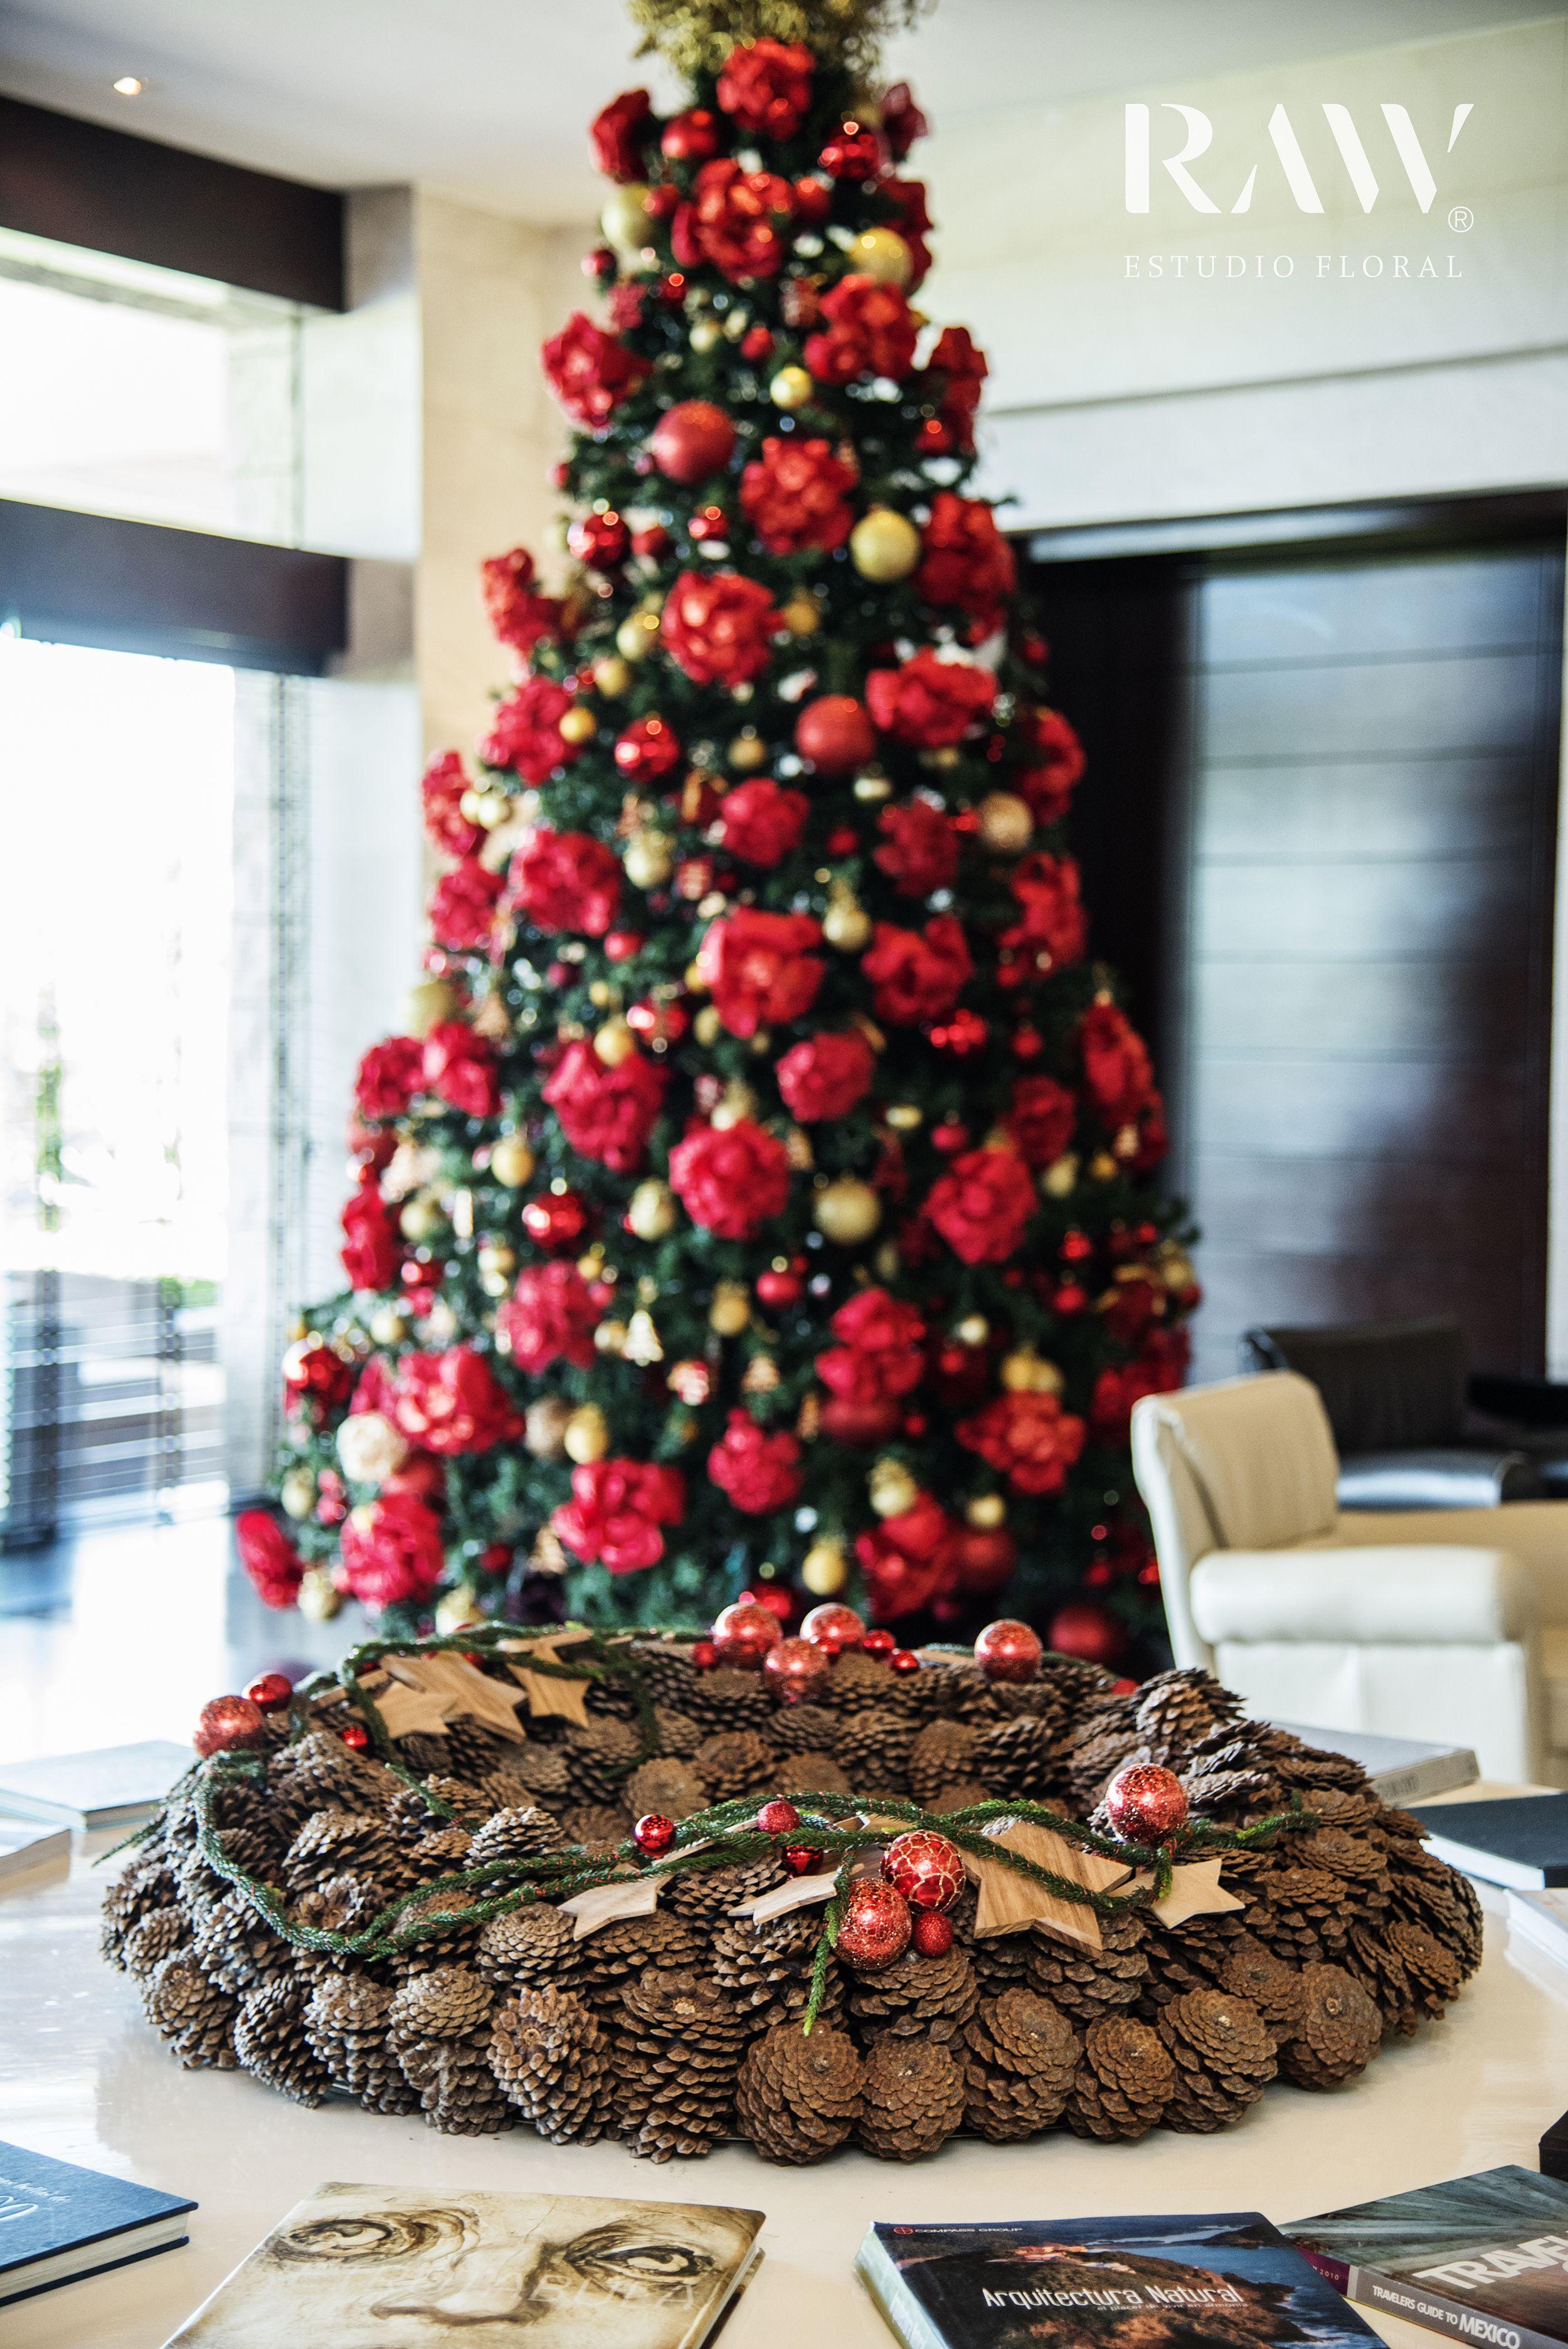 Christmas Floral Design Ideas #Christmasflowers